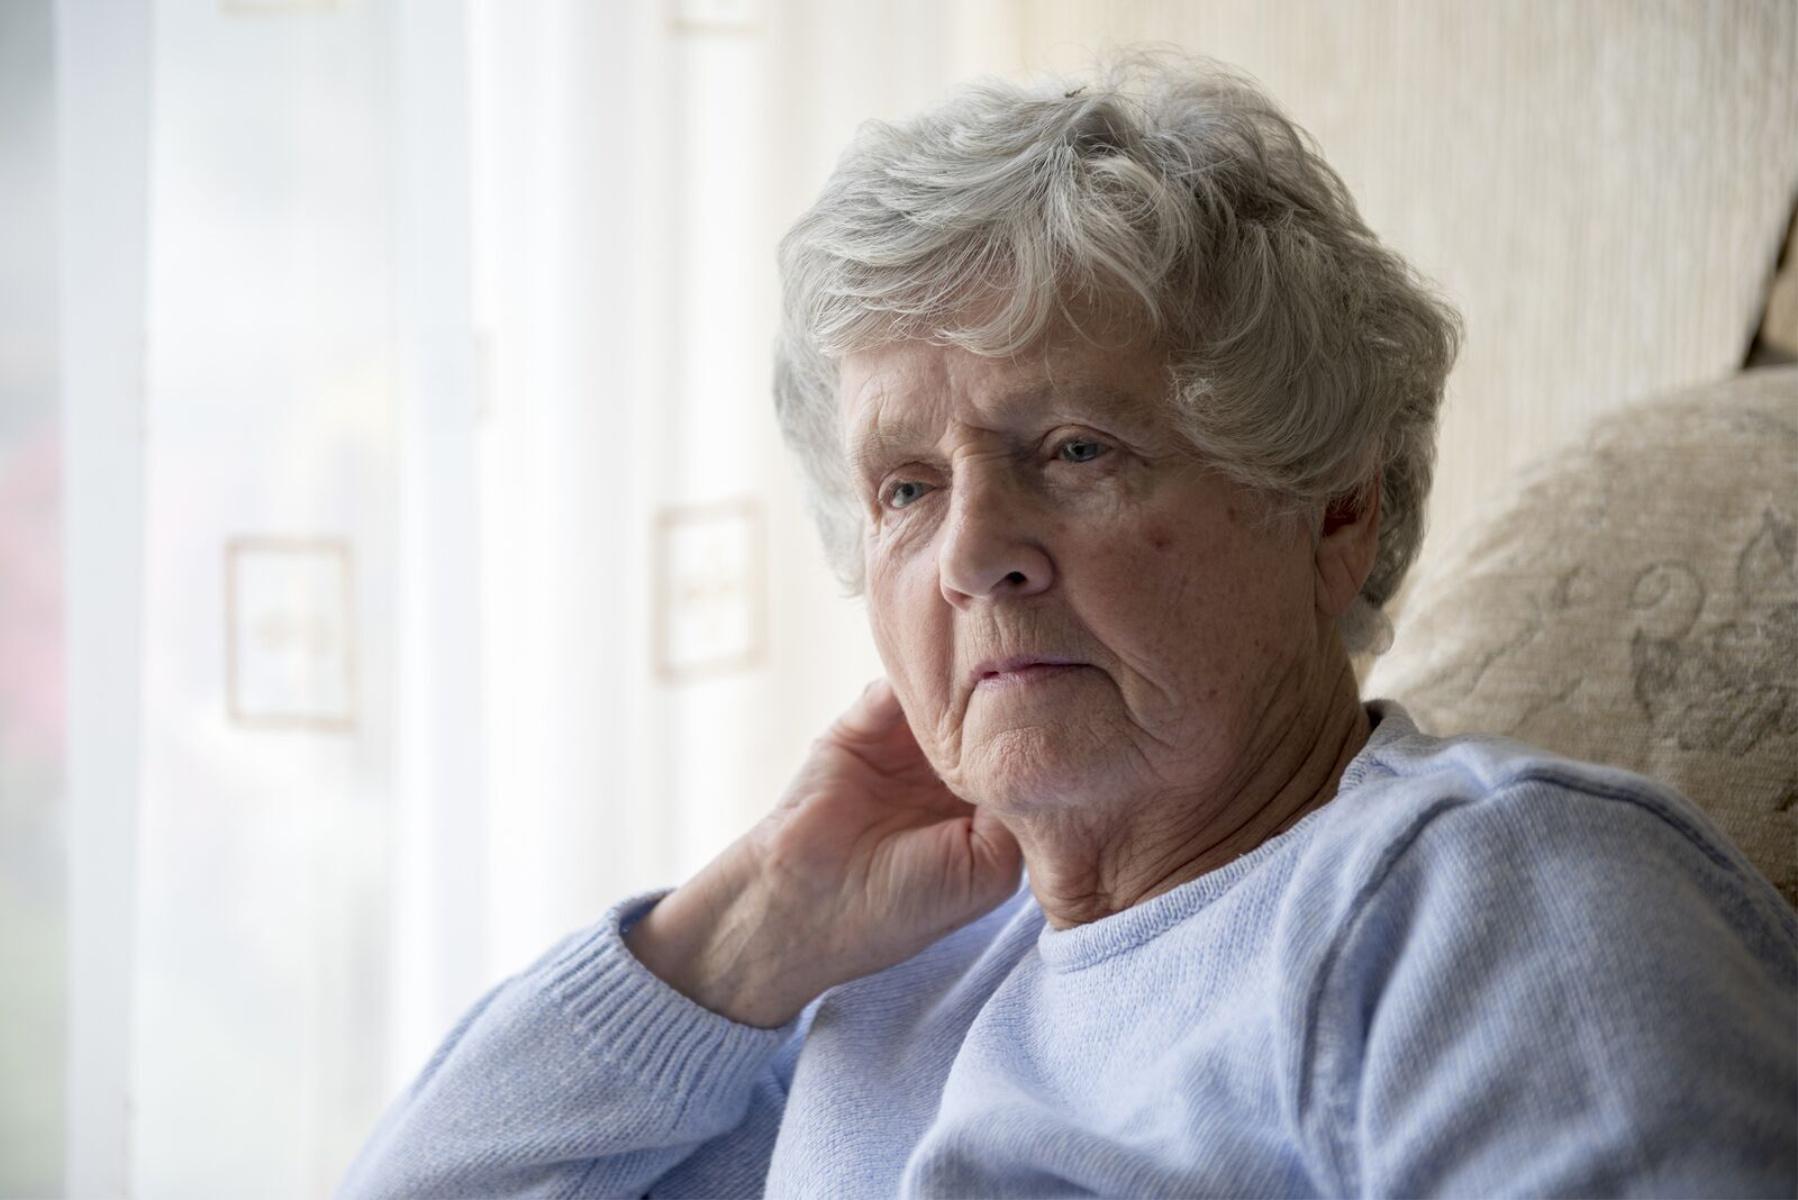 Medical Alarms in St. Louis MO:  Senior Depression